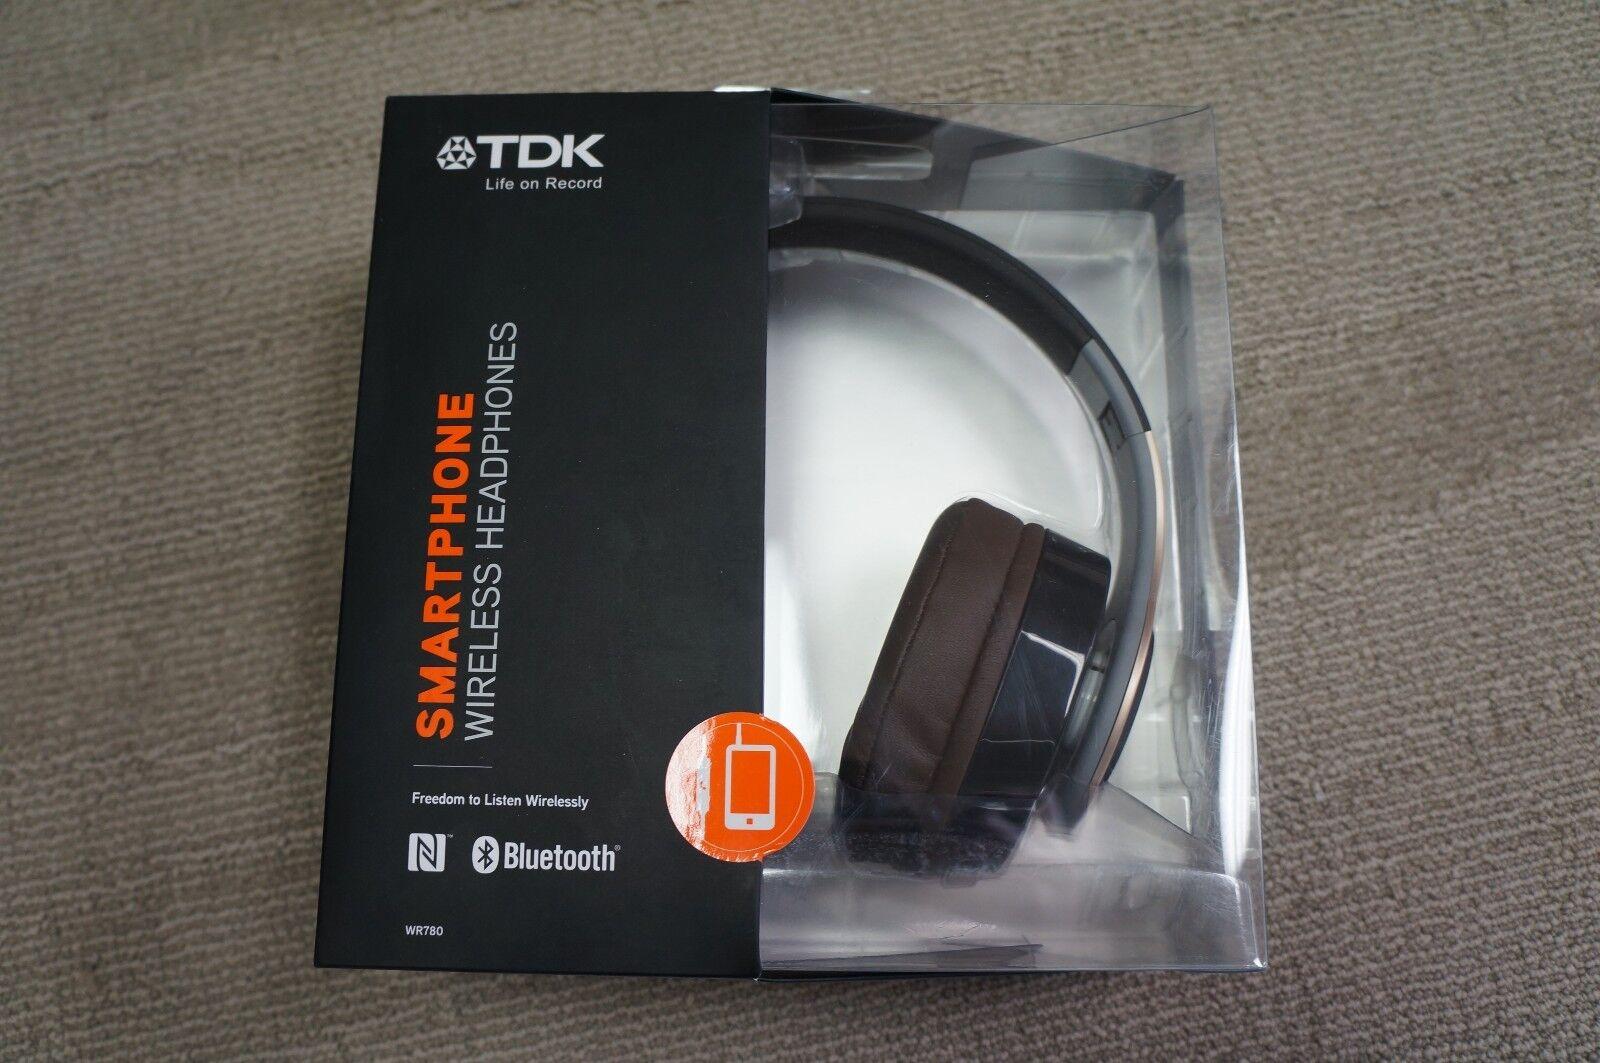 Tdk Wr780 Bluetooth Over Ear Headphones - Blackgold